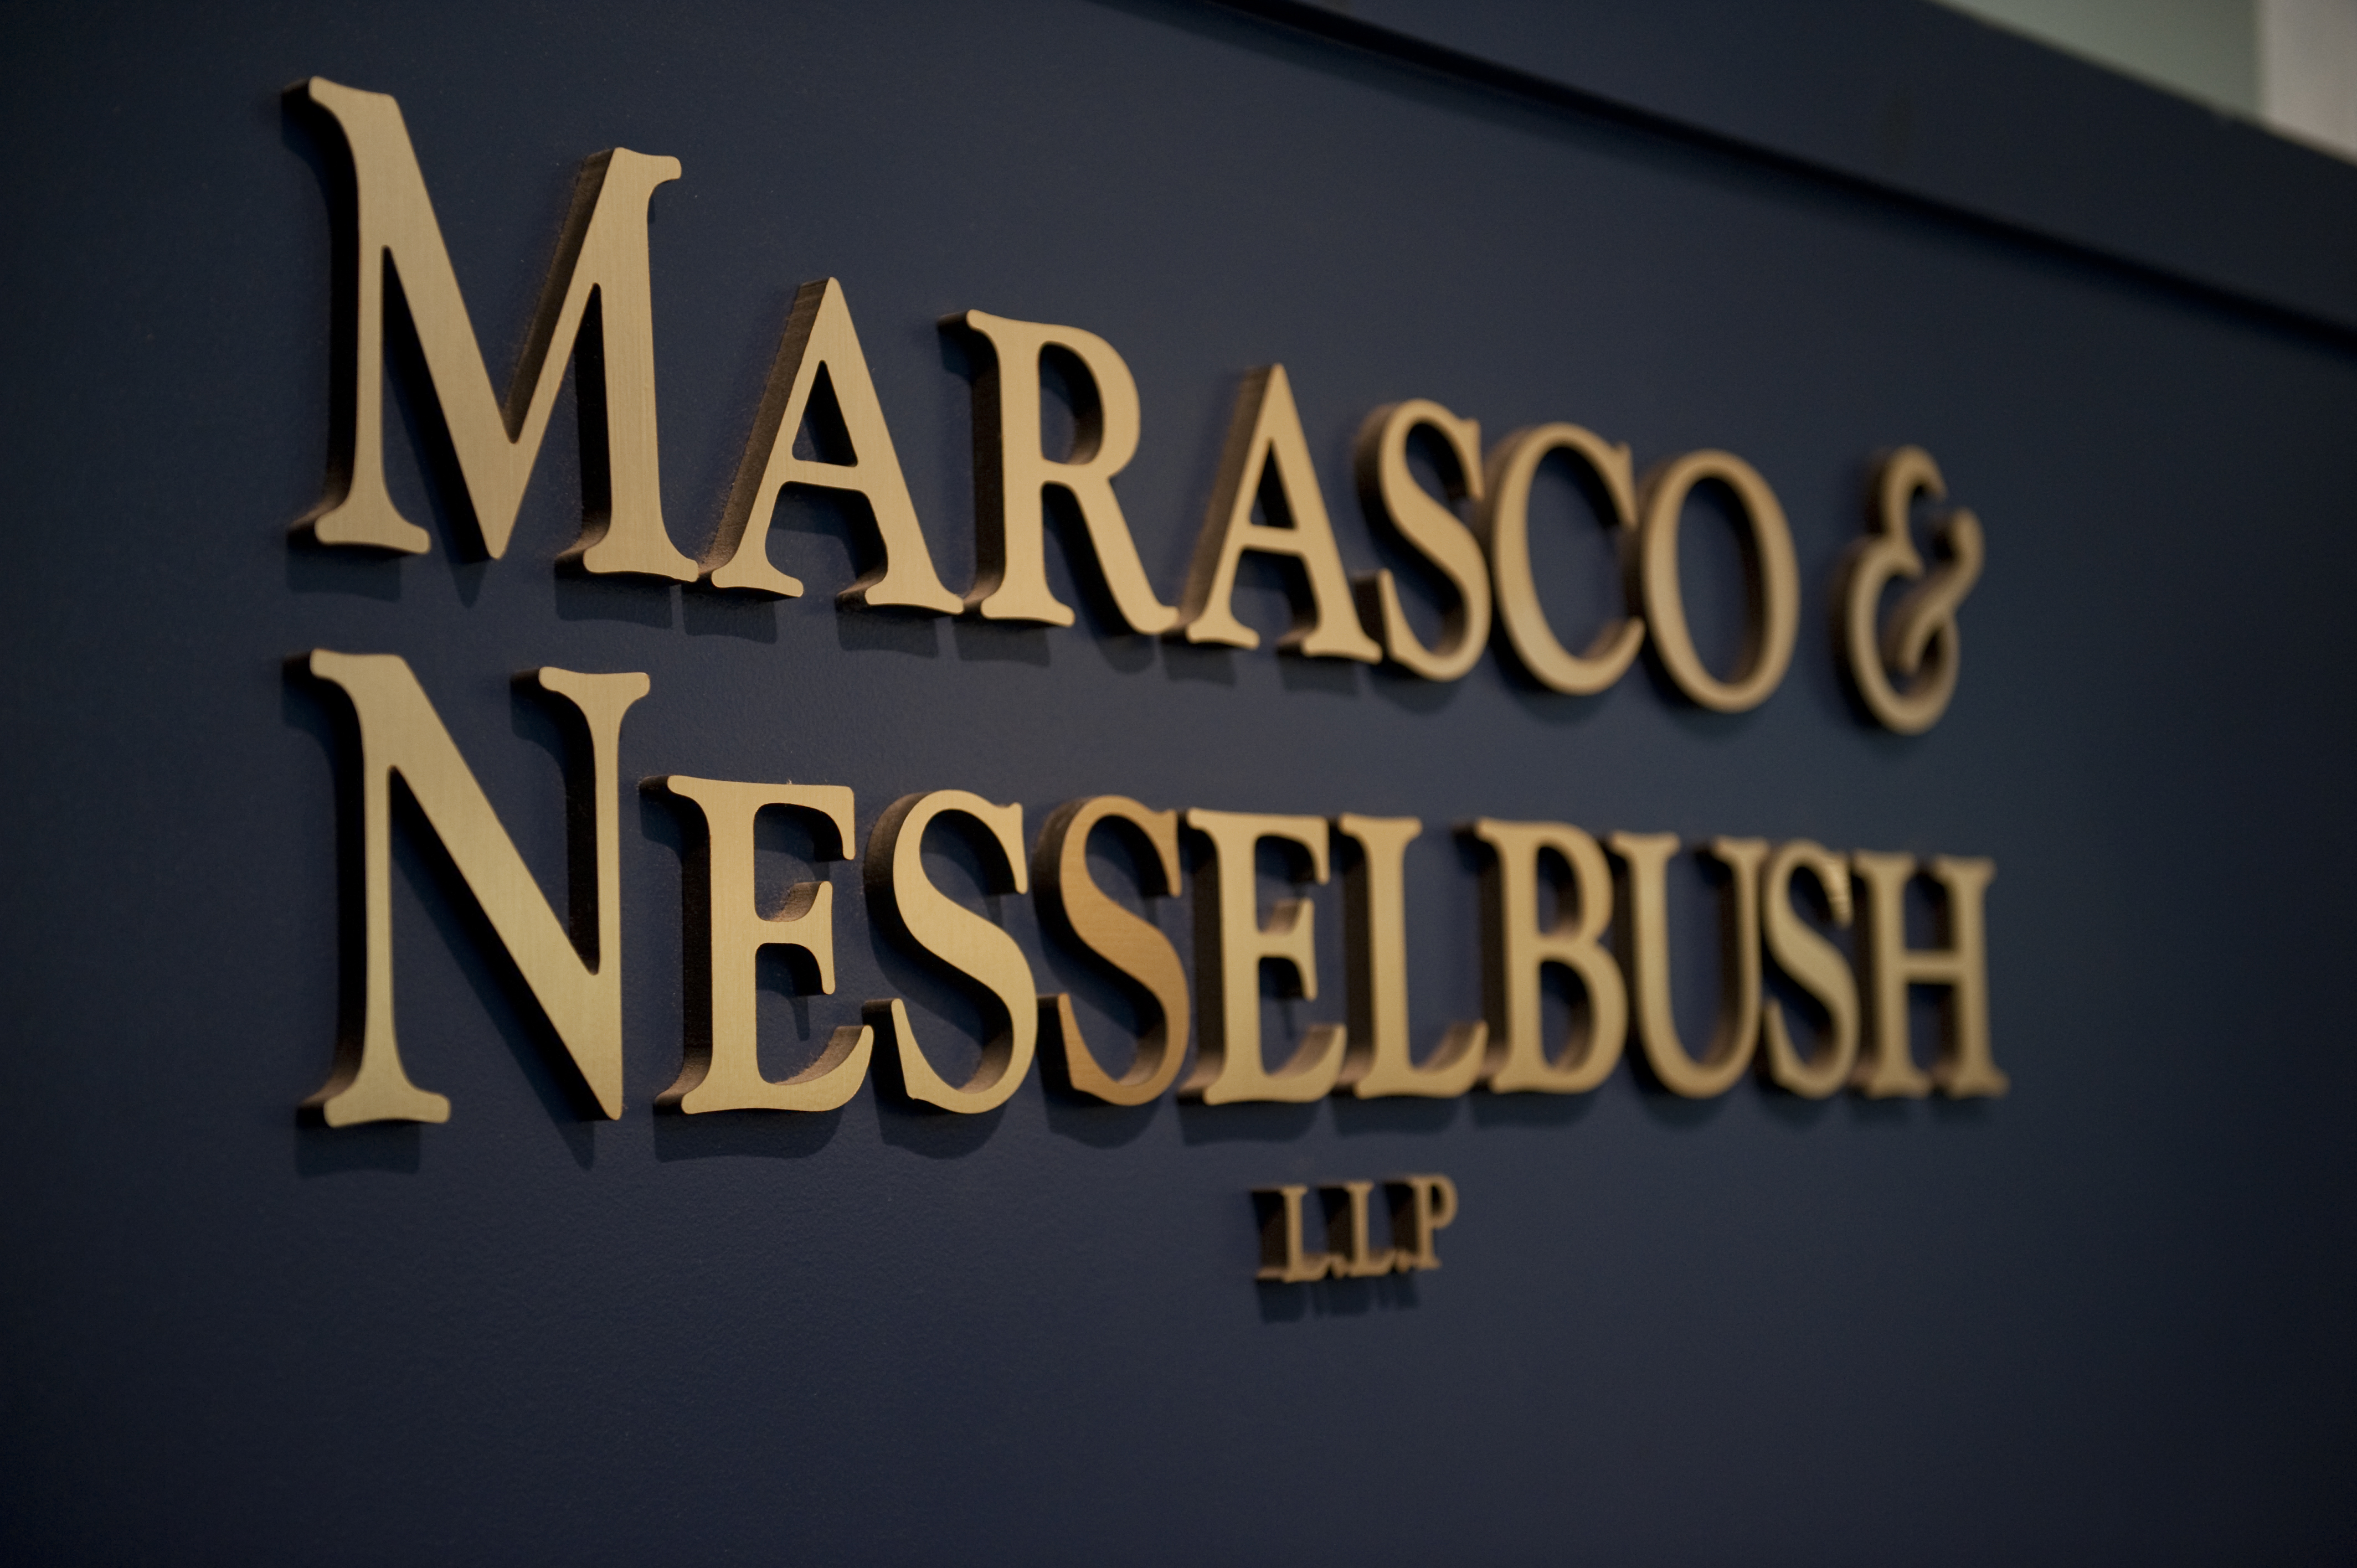 Marasco & Nesselbush, LLP